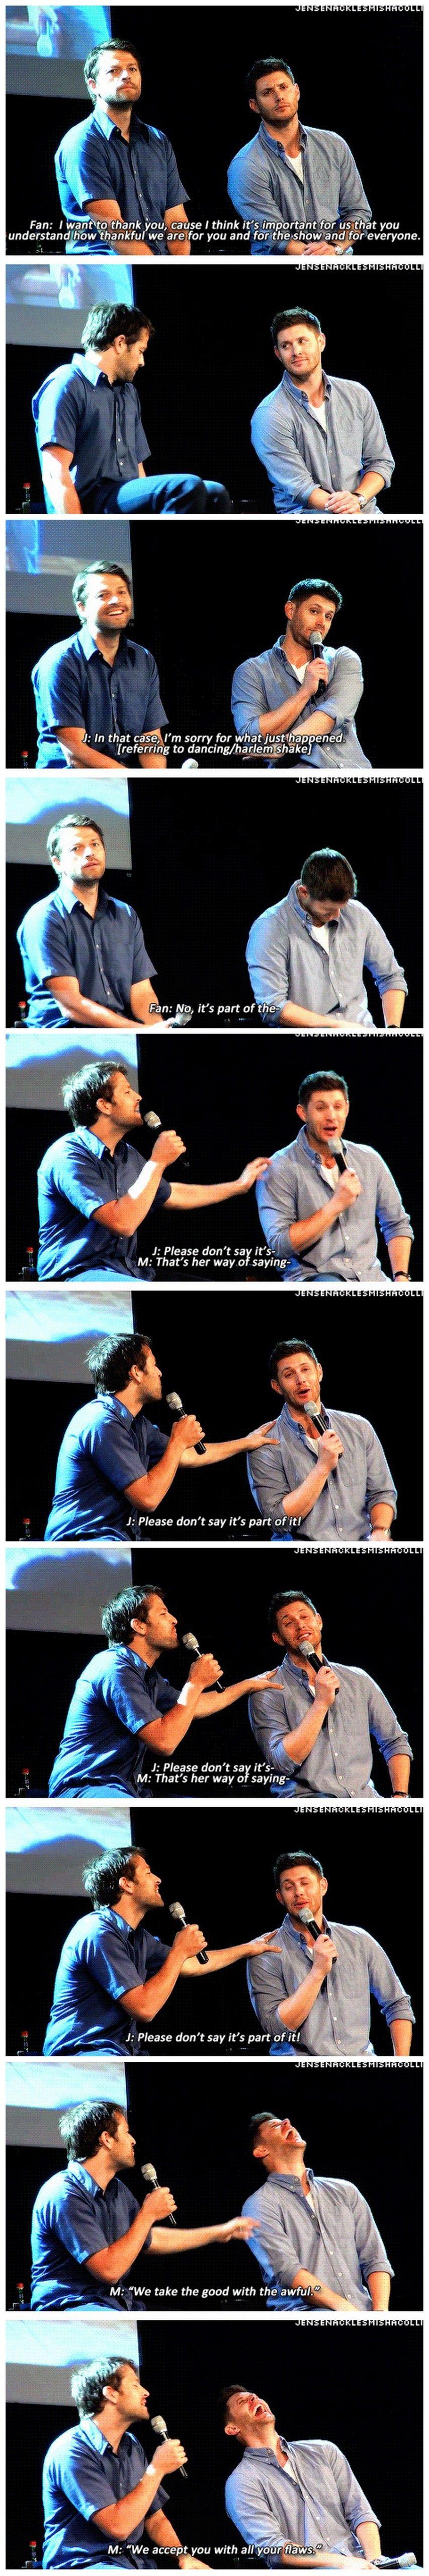 [gifset] After the Harlem Shake ... Jensen's embarrassment kicks in... <3